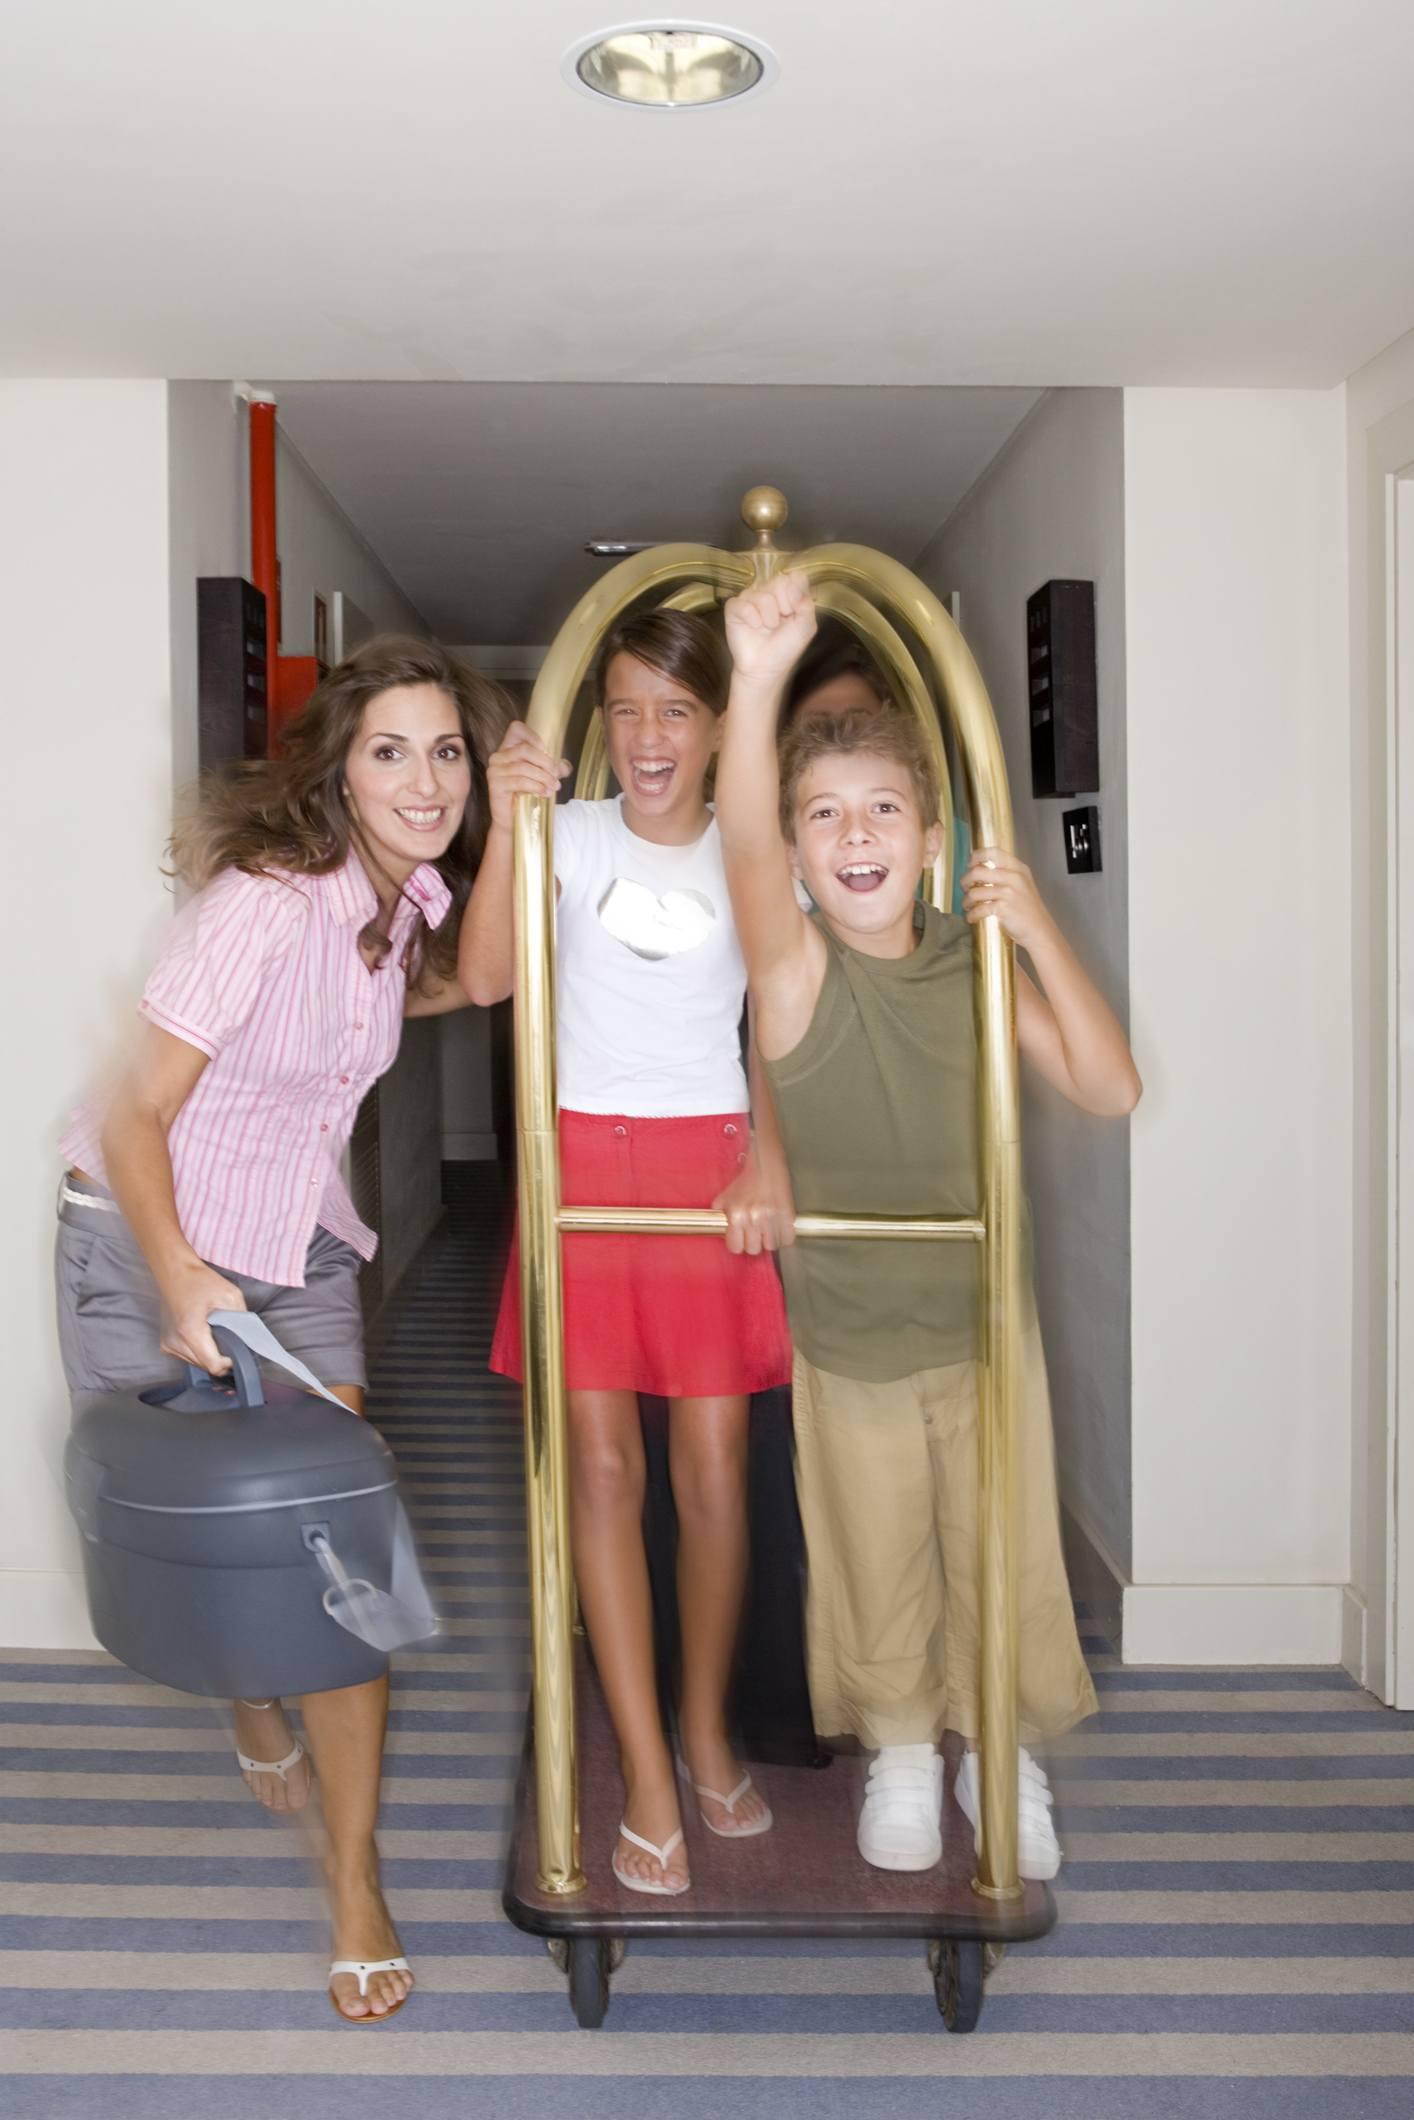 Children making noise in the hallway